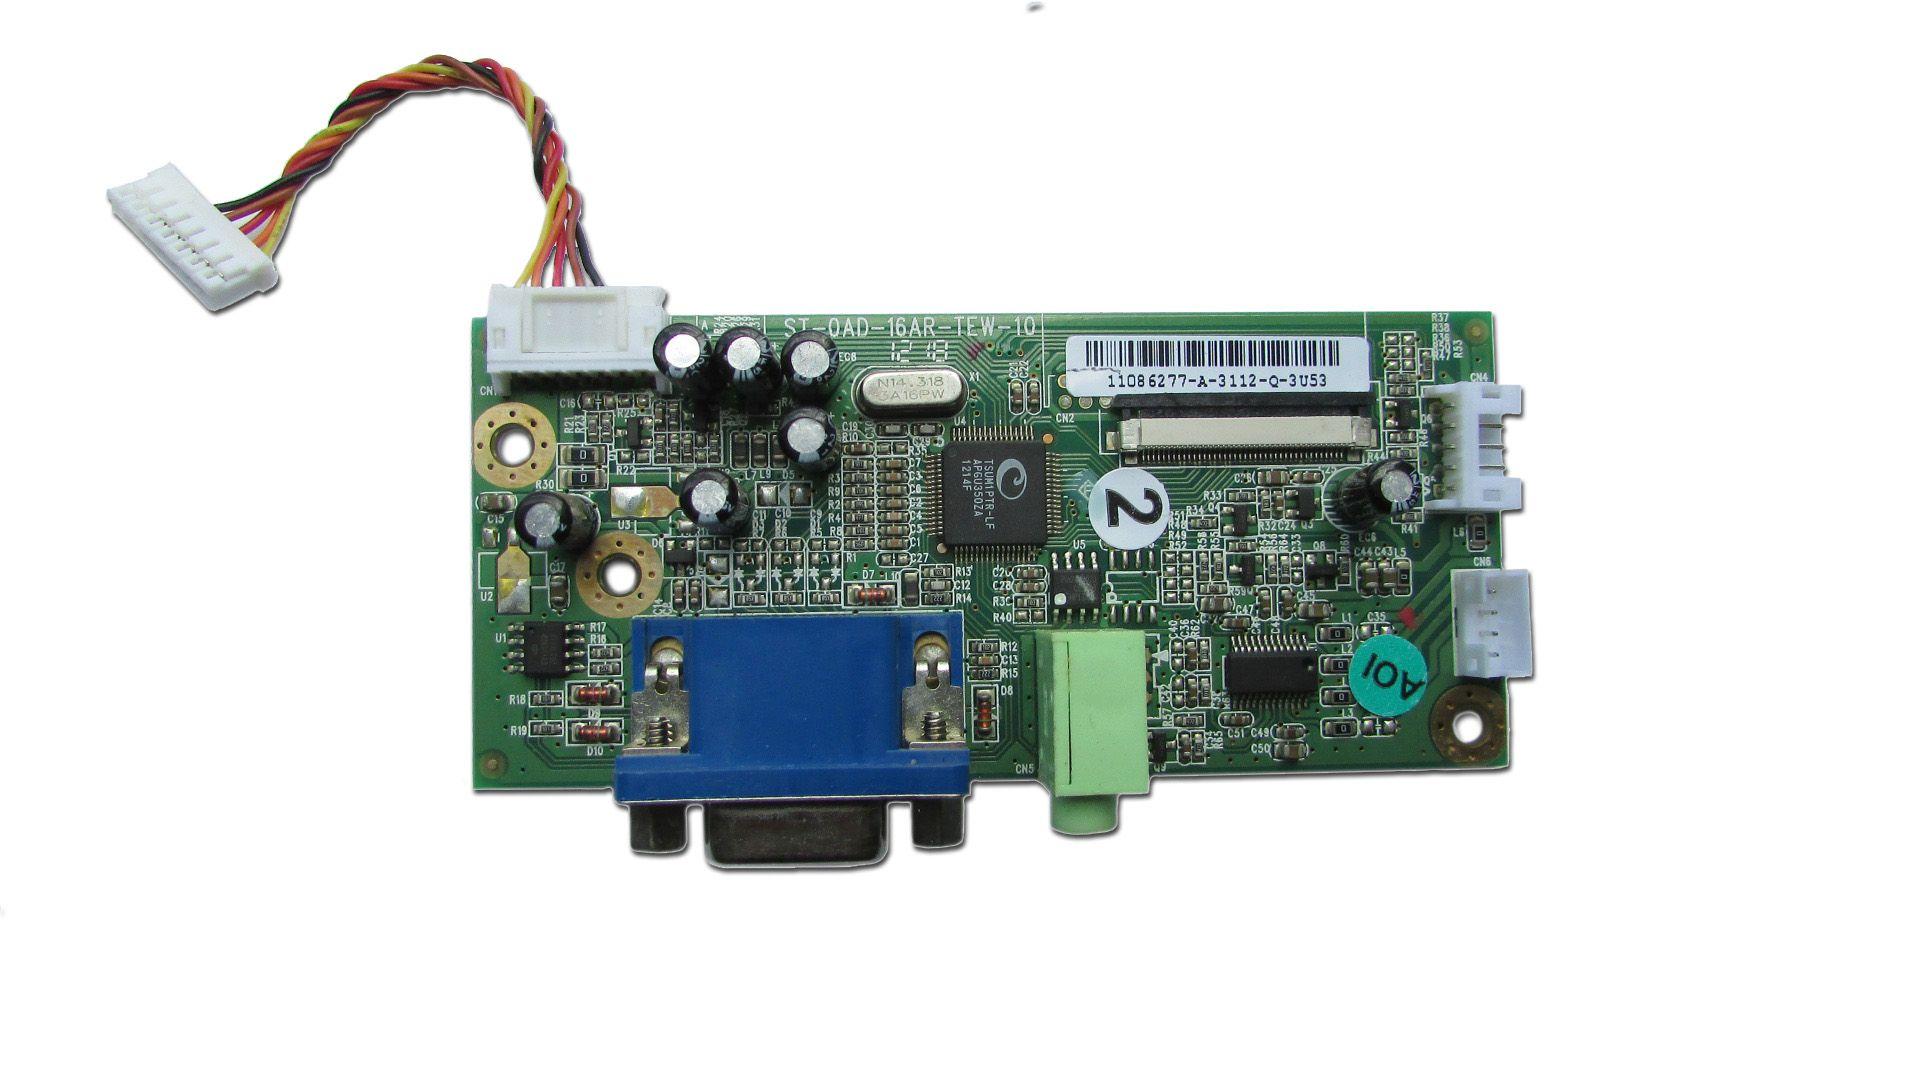 Placa VGA Monitor positivo Smile 5611 PN: St-oad-16ar-tew-10  - Retirado